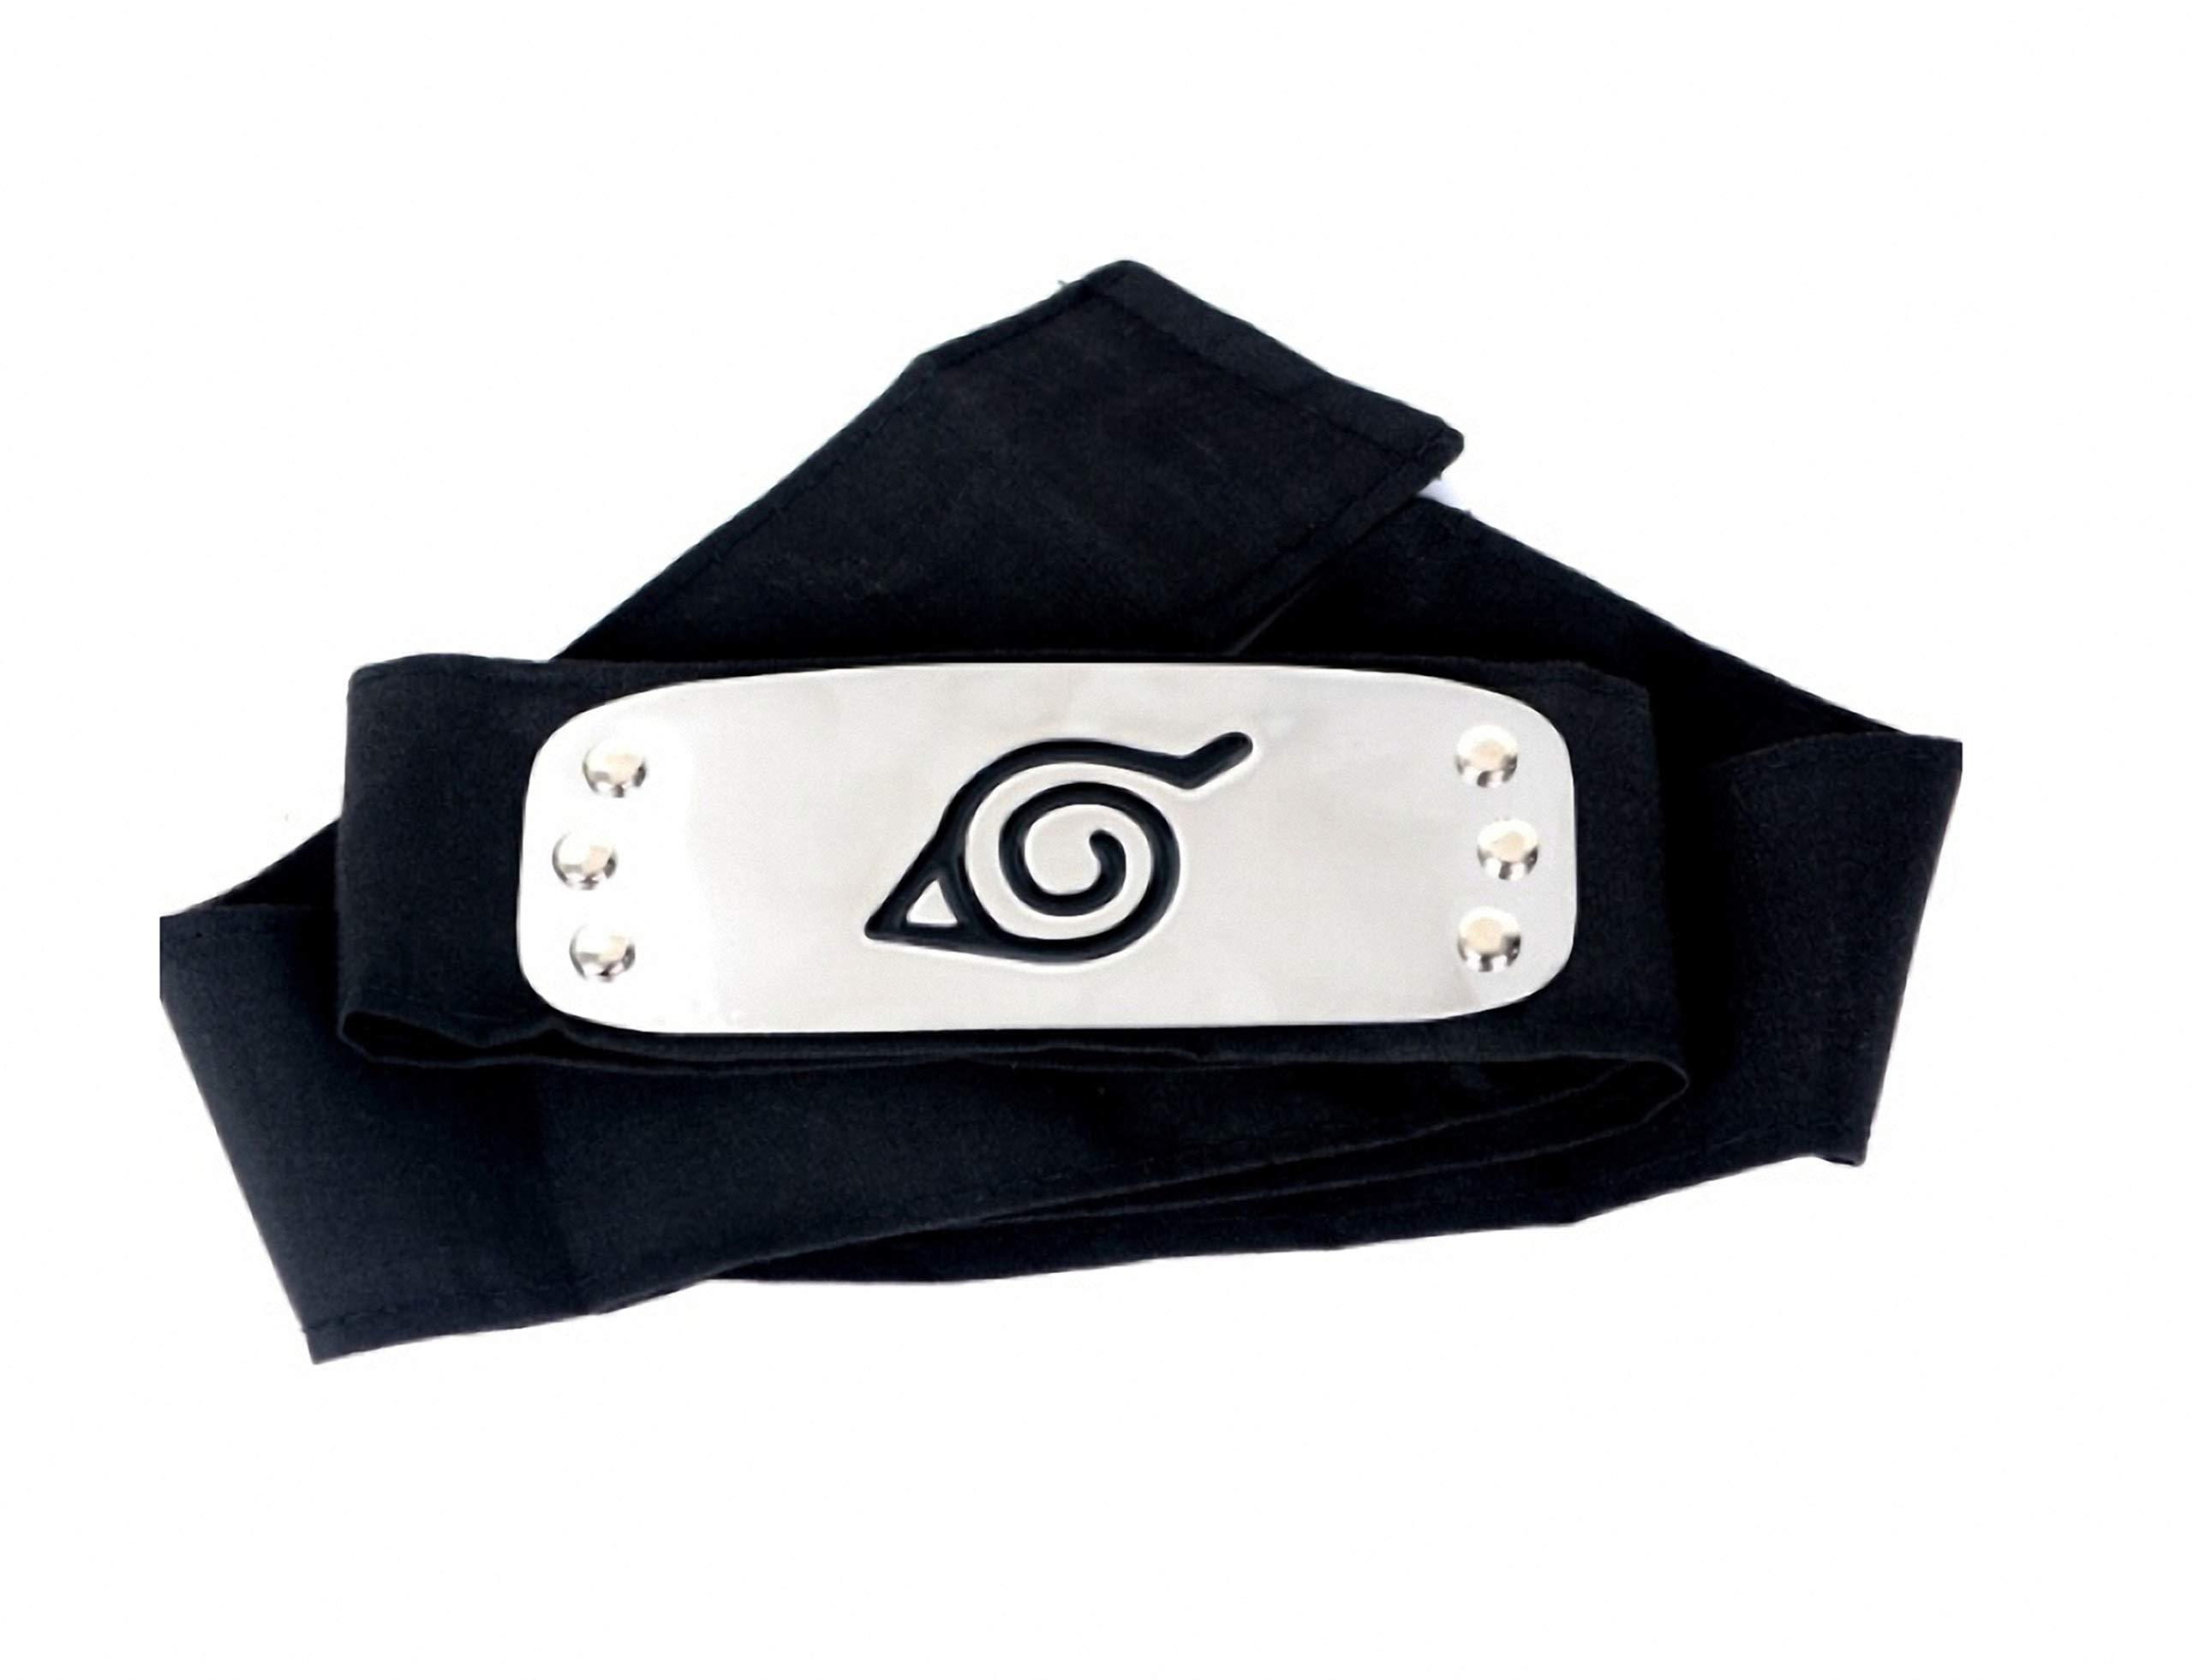 Naruto Headband Konohagakure Shinobi Anime Manga Cosplay Accessories - Black